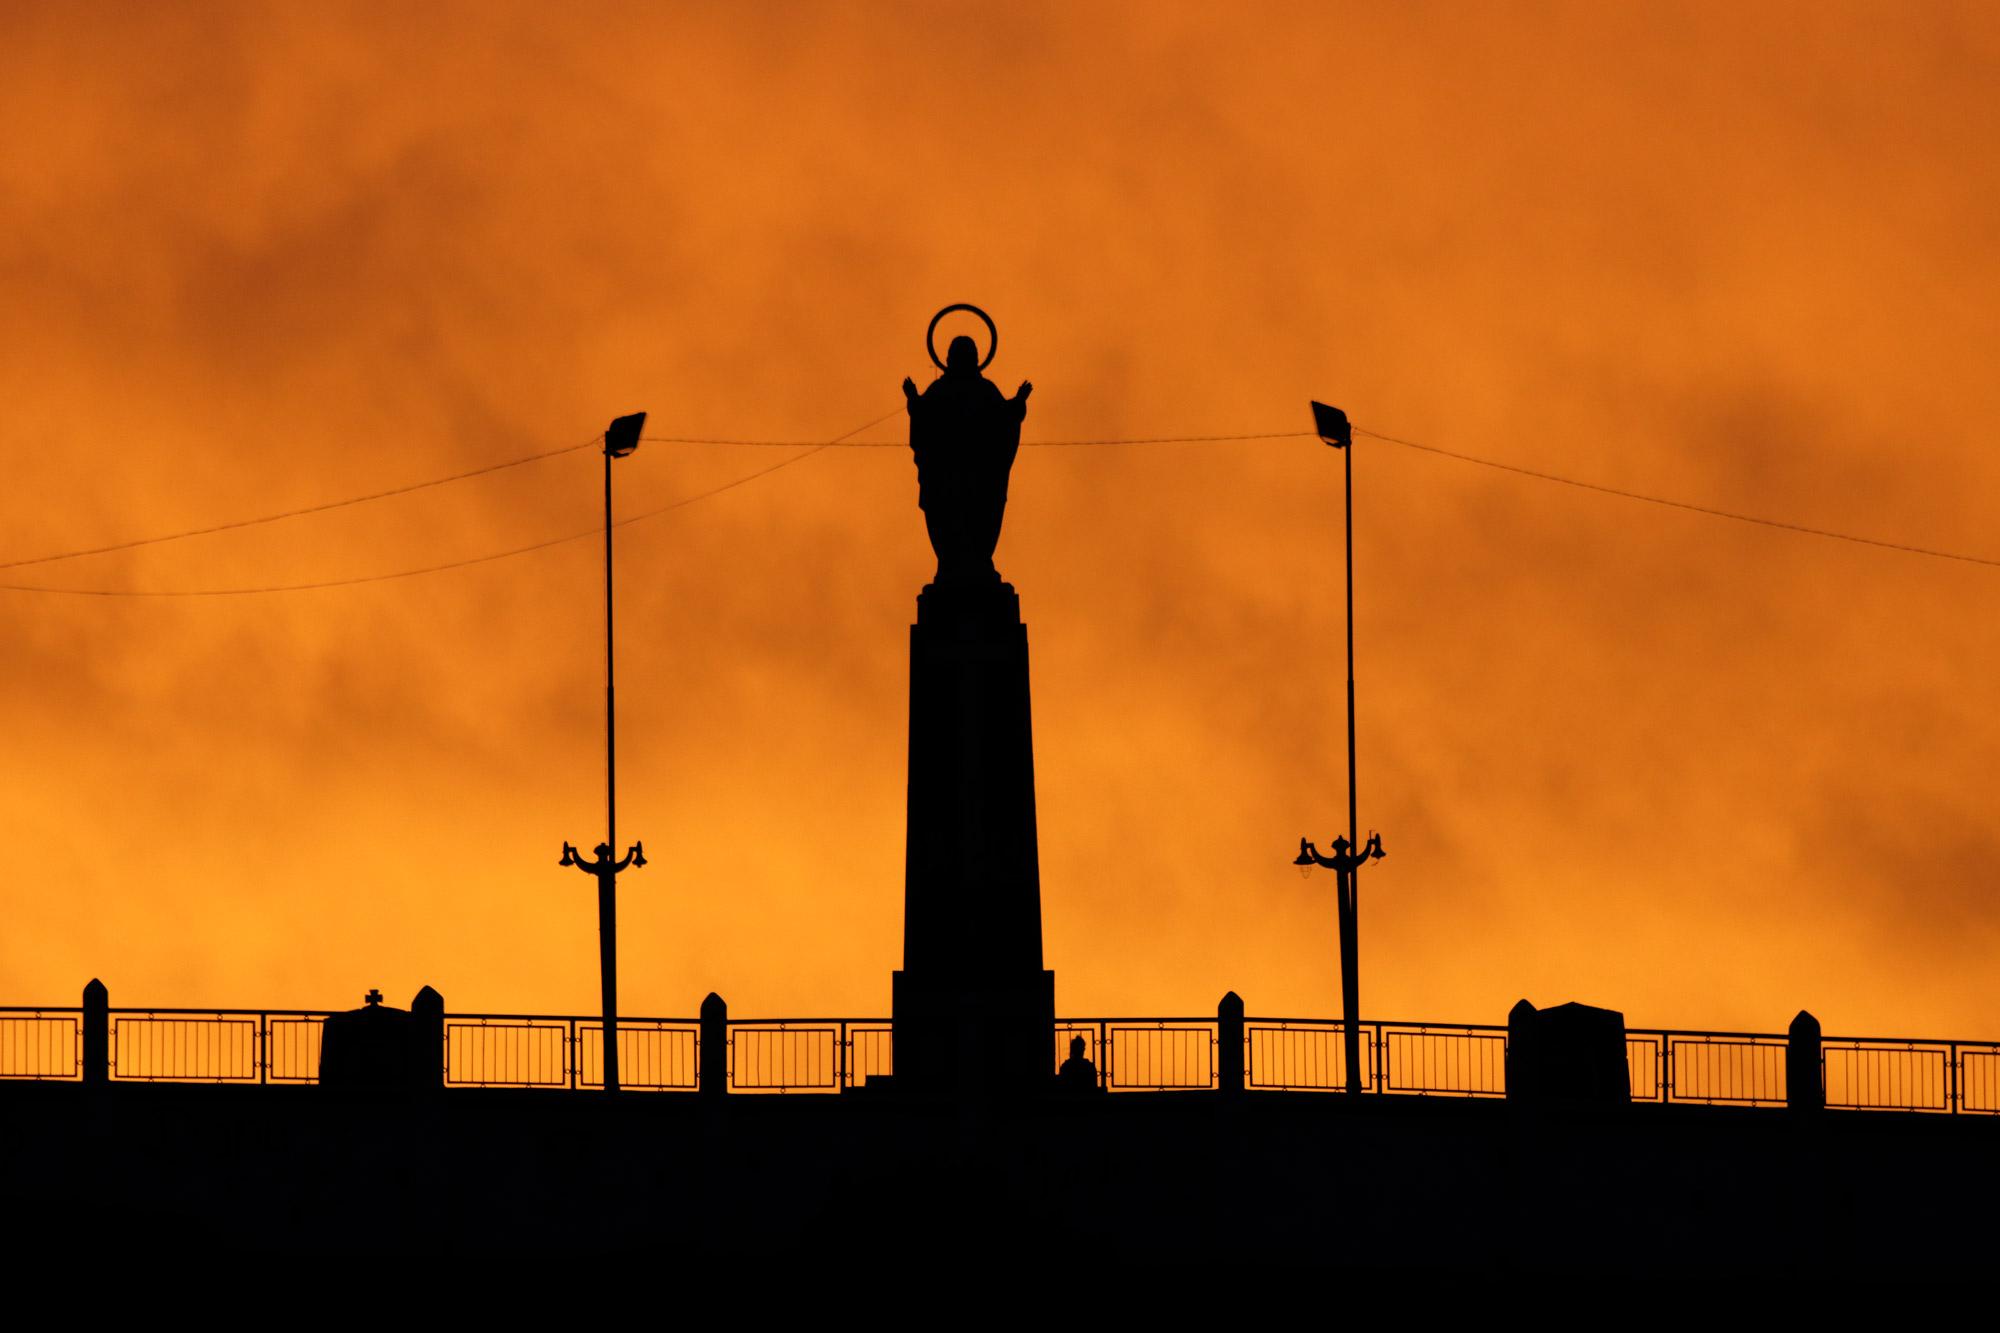 Bolivia 2016 - Dag 8 - Het jezusbeeld in Tupiza bij zonsondergang